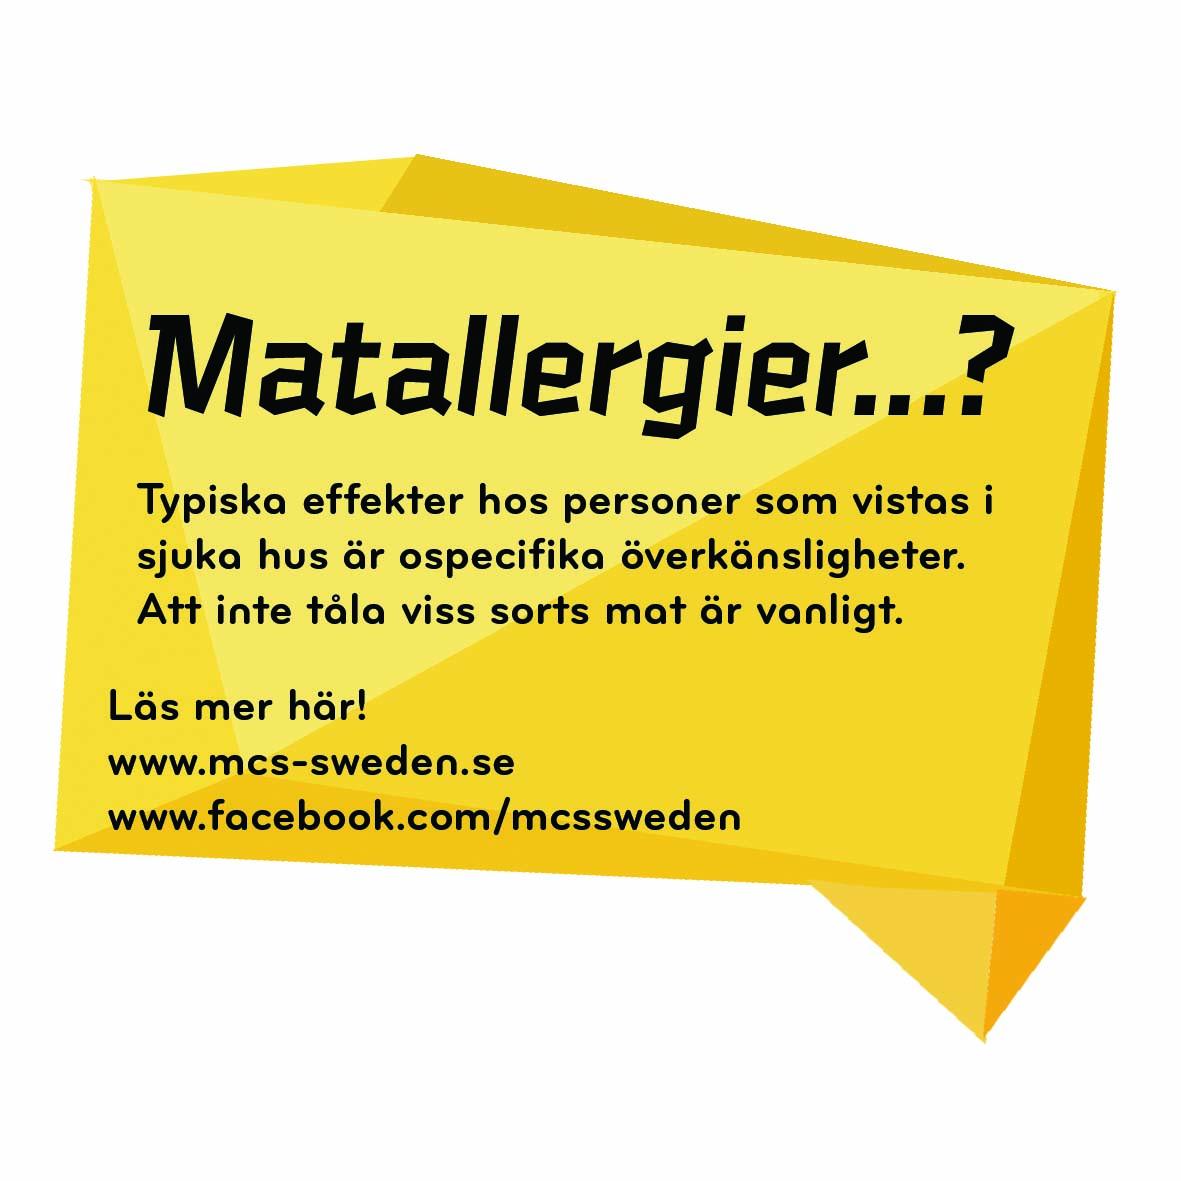 Matallergier